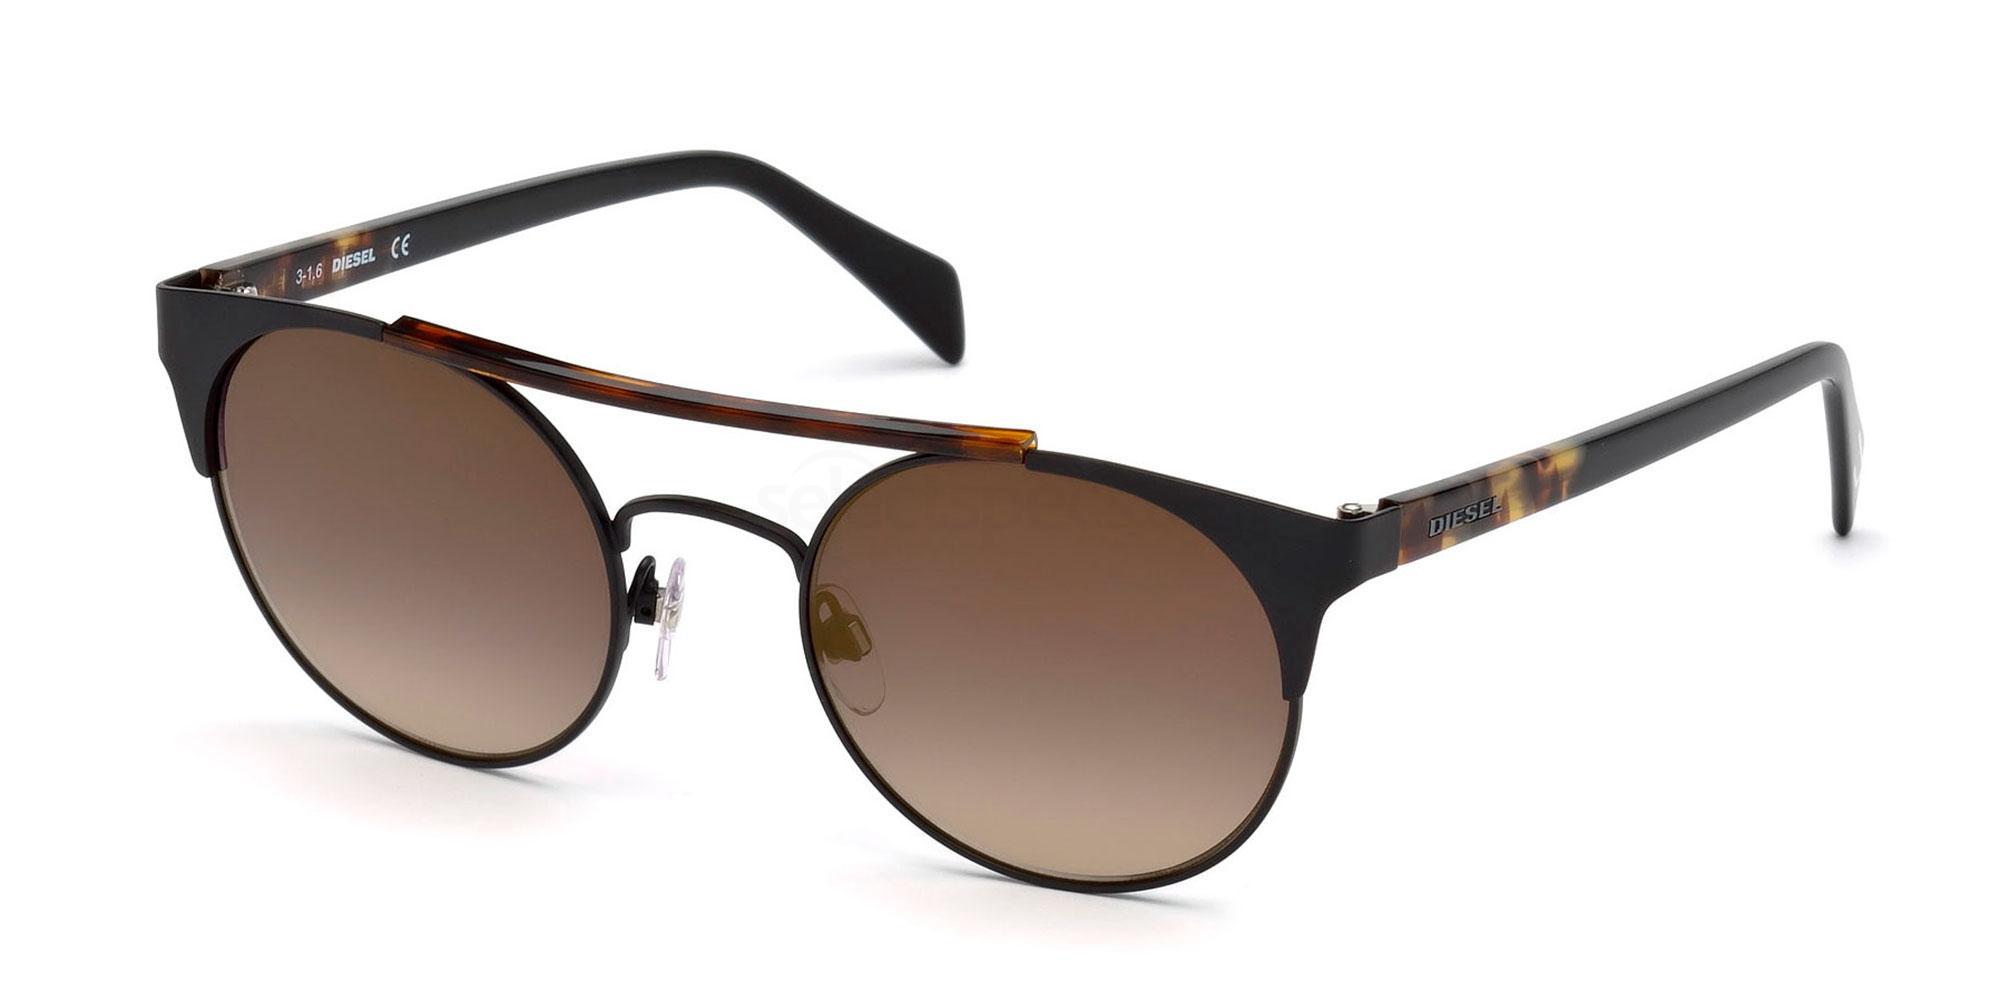 05G DL0218 Sunglasses, Diesel